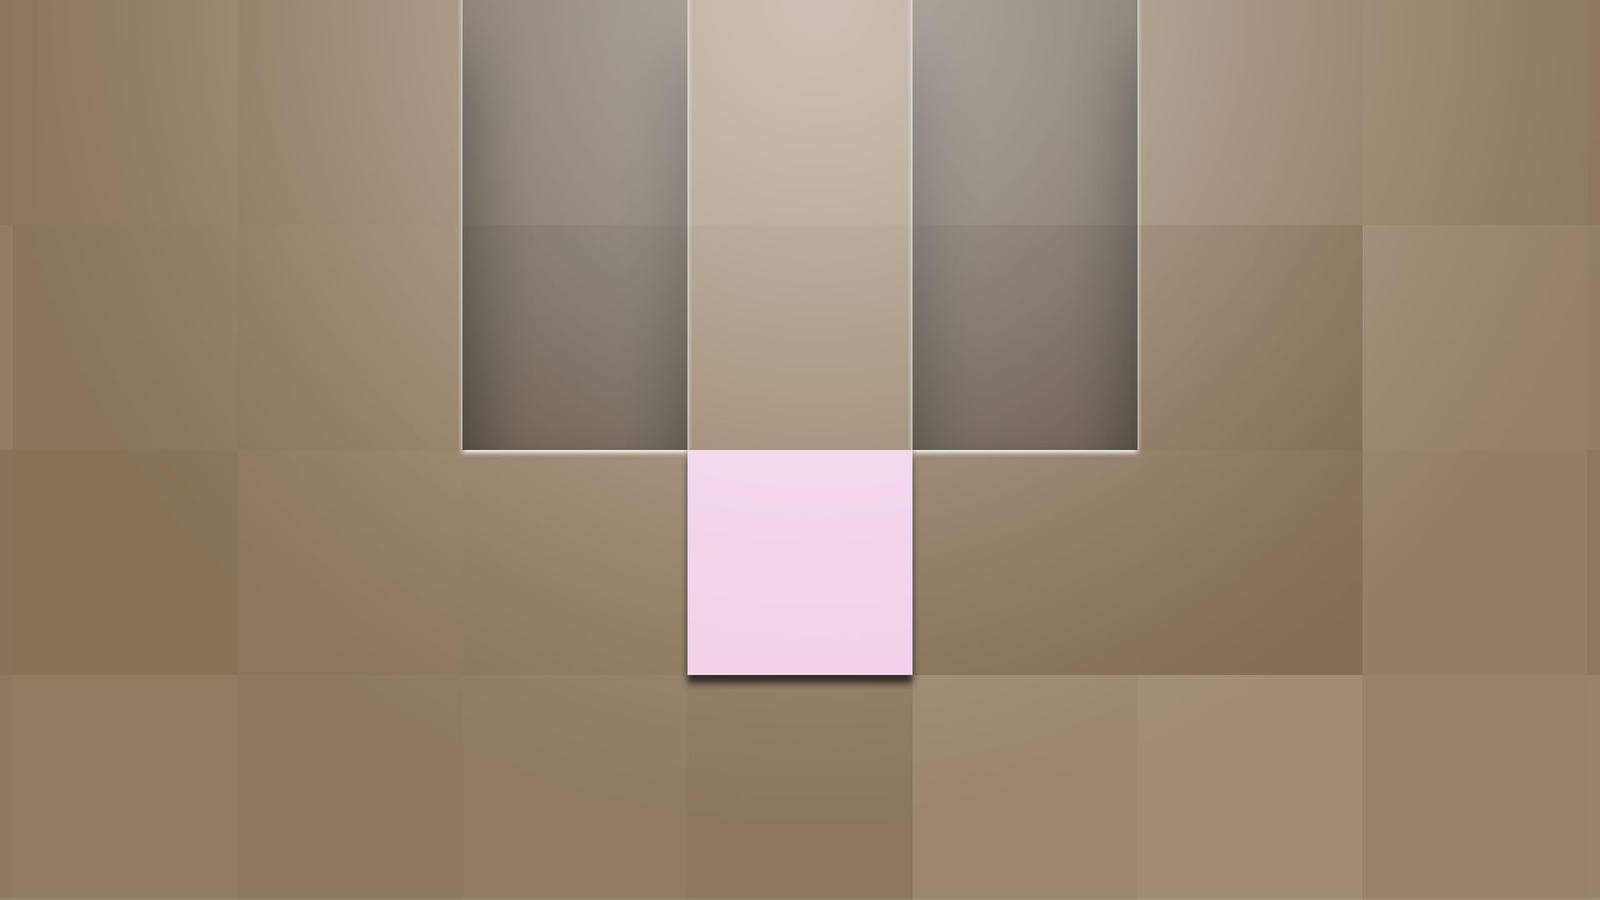 Good Wallpaper Minecraft Square - minecraft_wallpaper__rabbit_by_halo4guest-d8axacm  2018_96381.jpg